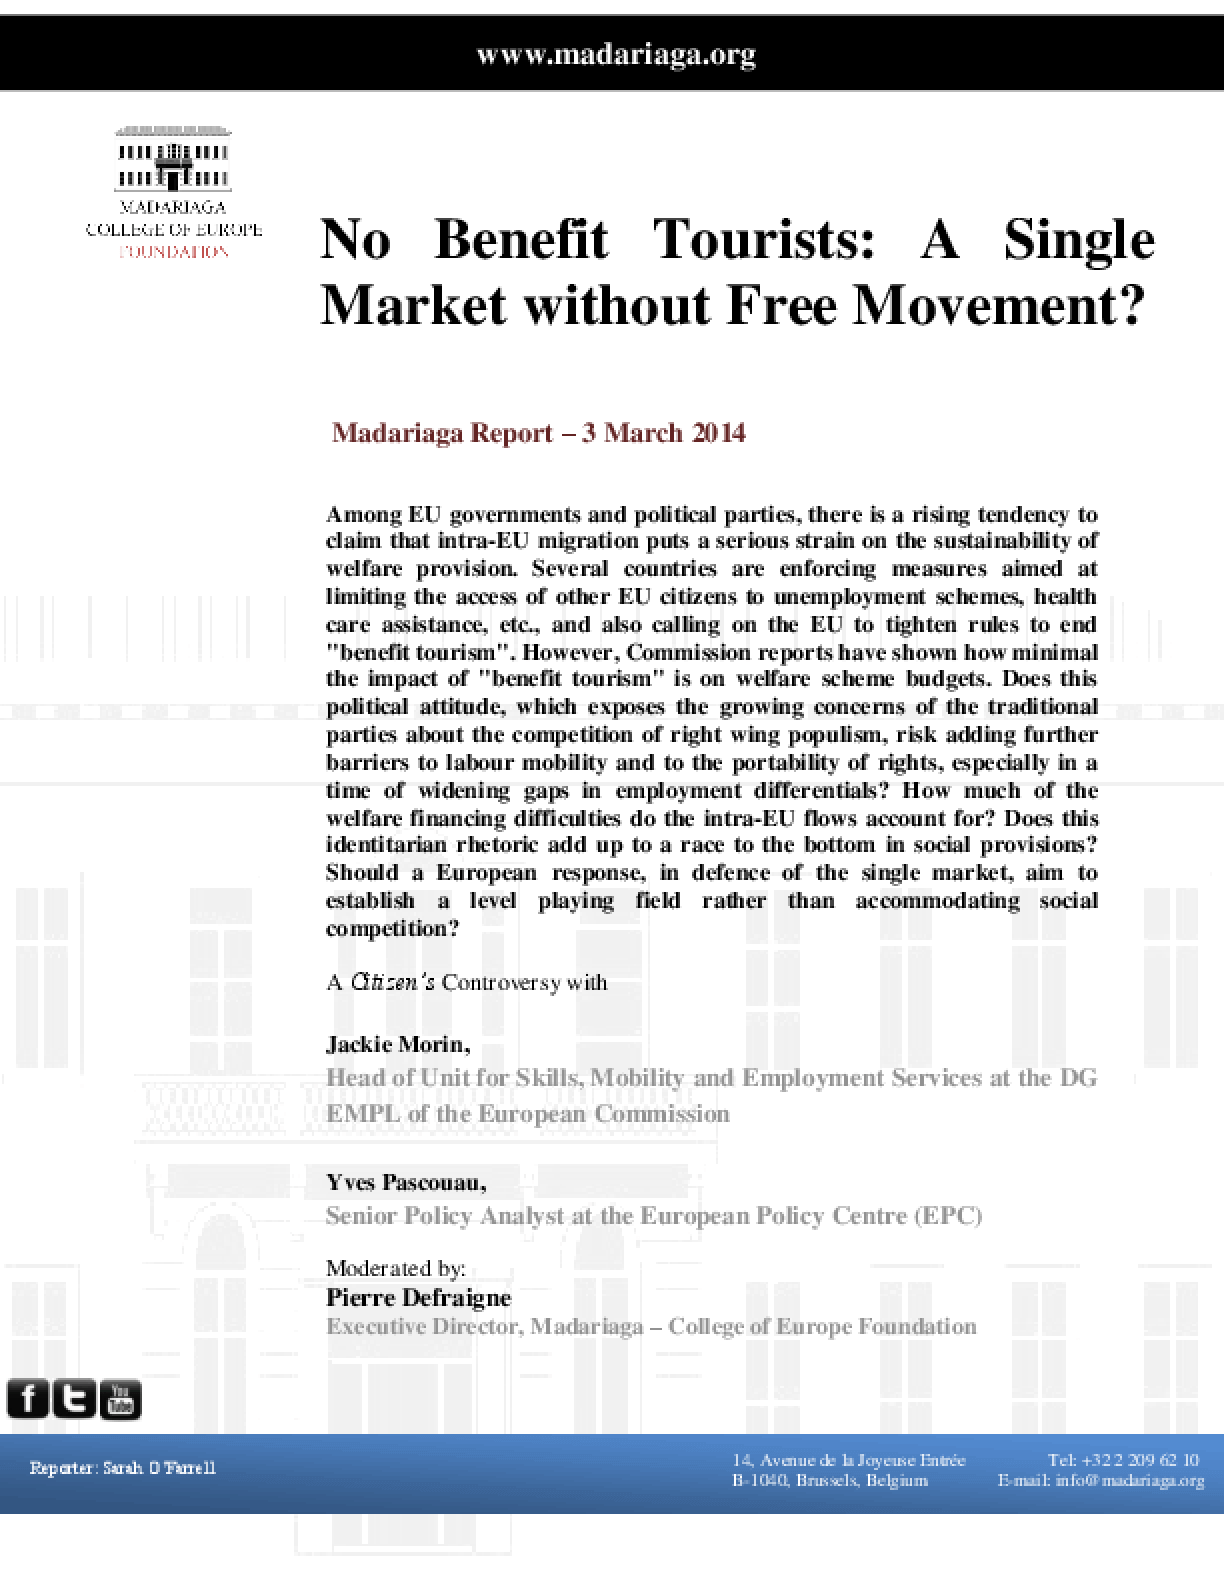 No Benefit Tourists: A Single Market without Free Movement?